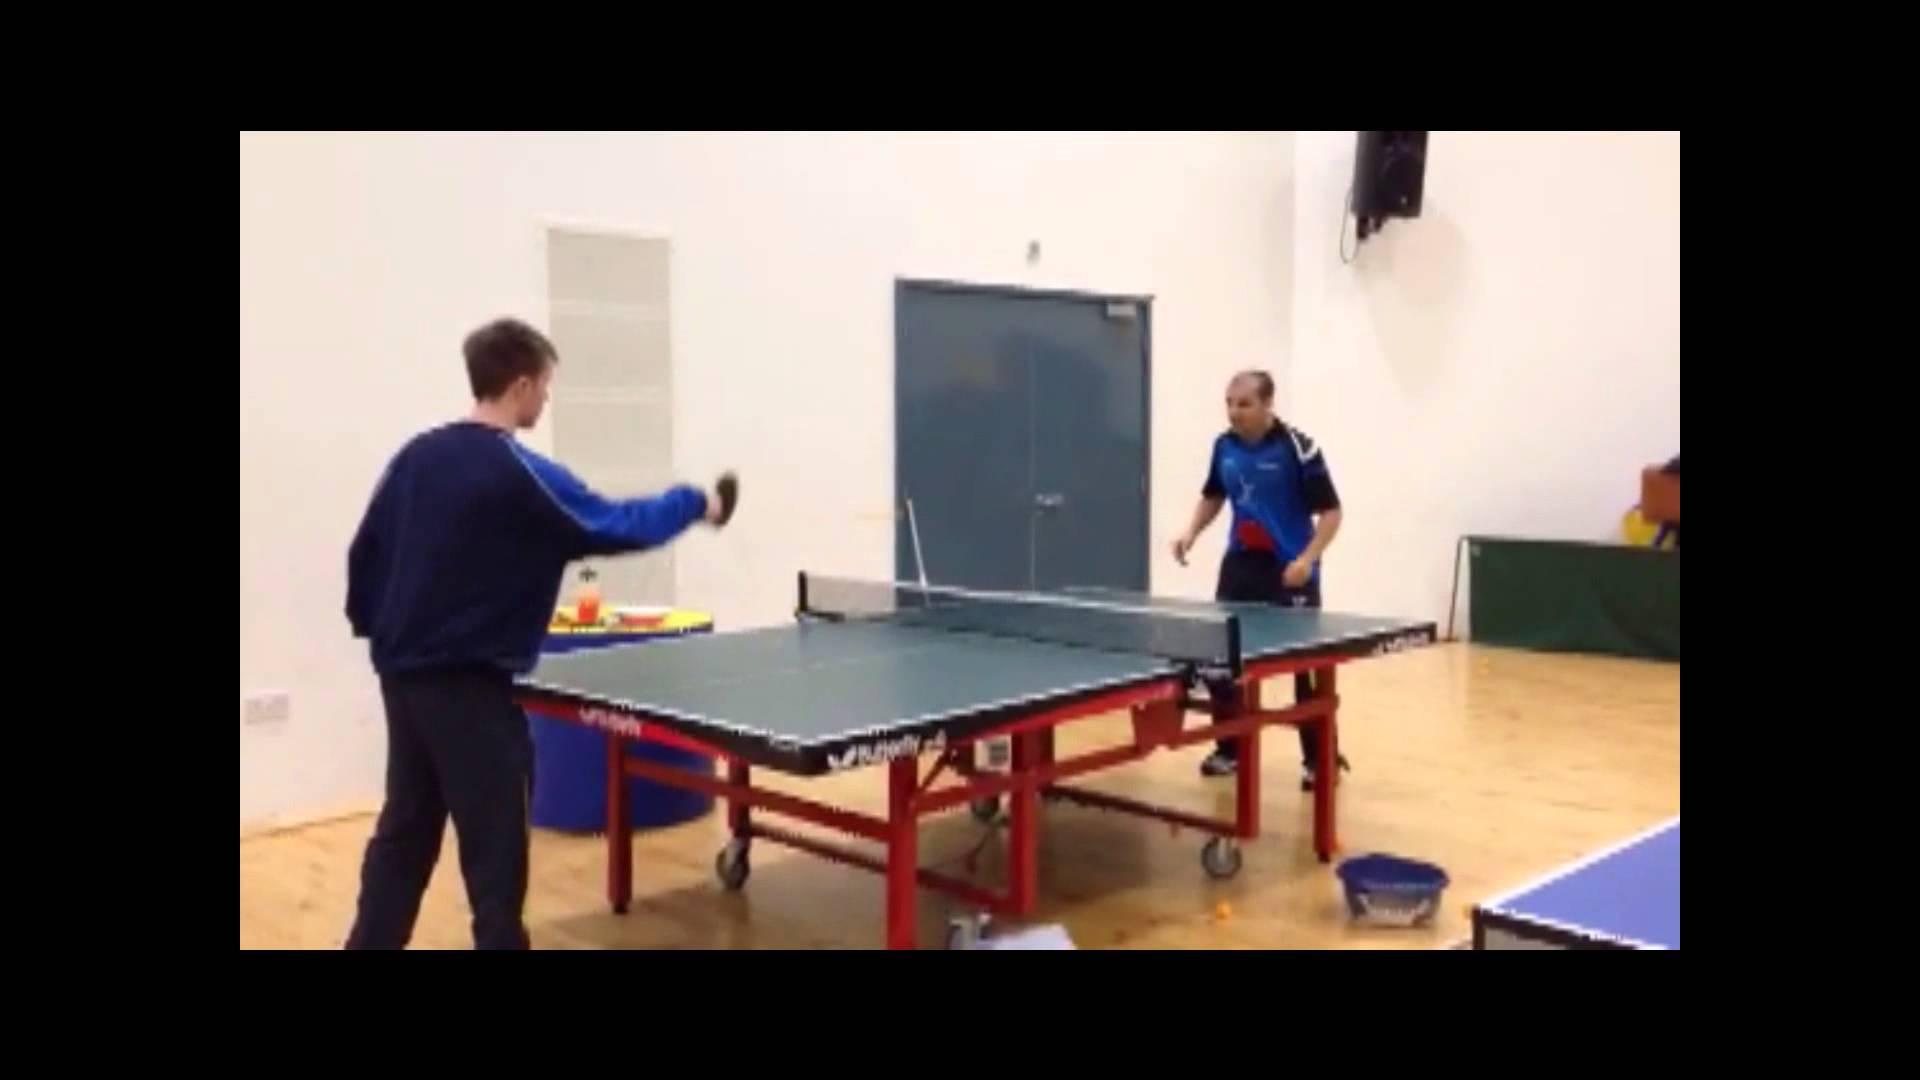 TABLE TENNIS TRICKS